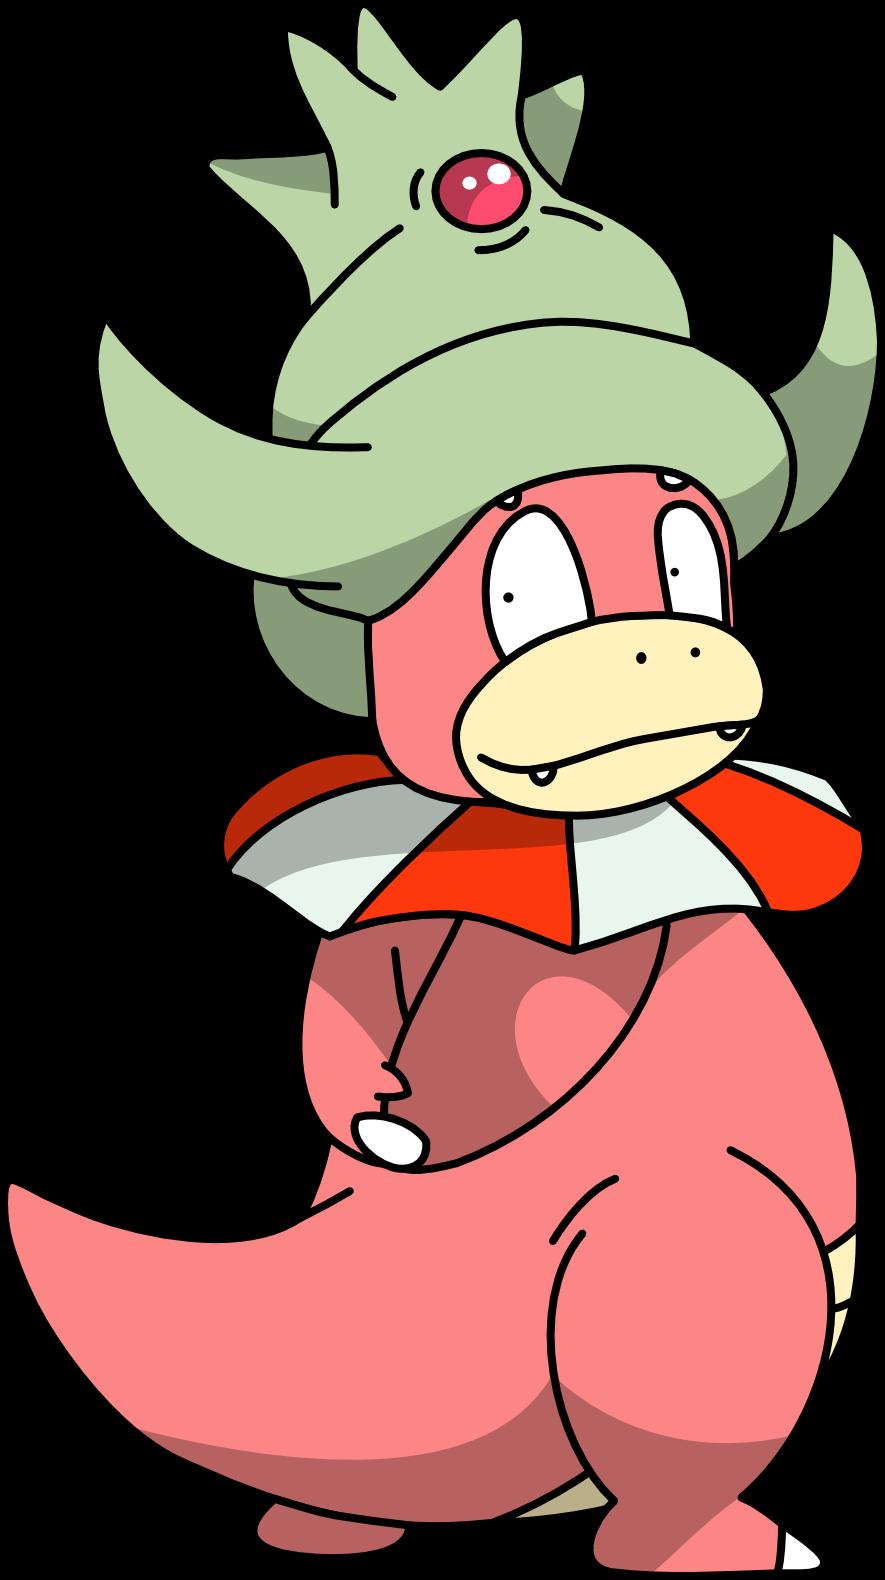 opachii s pokemon go guides preparing for second generation